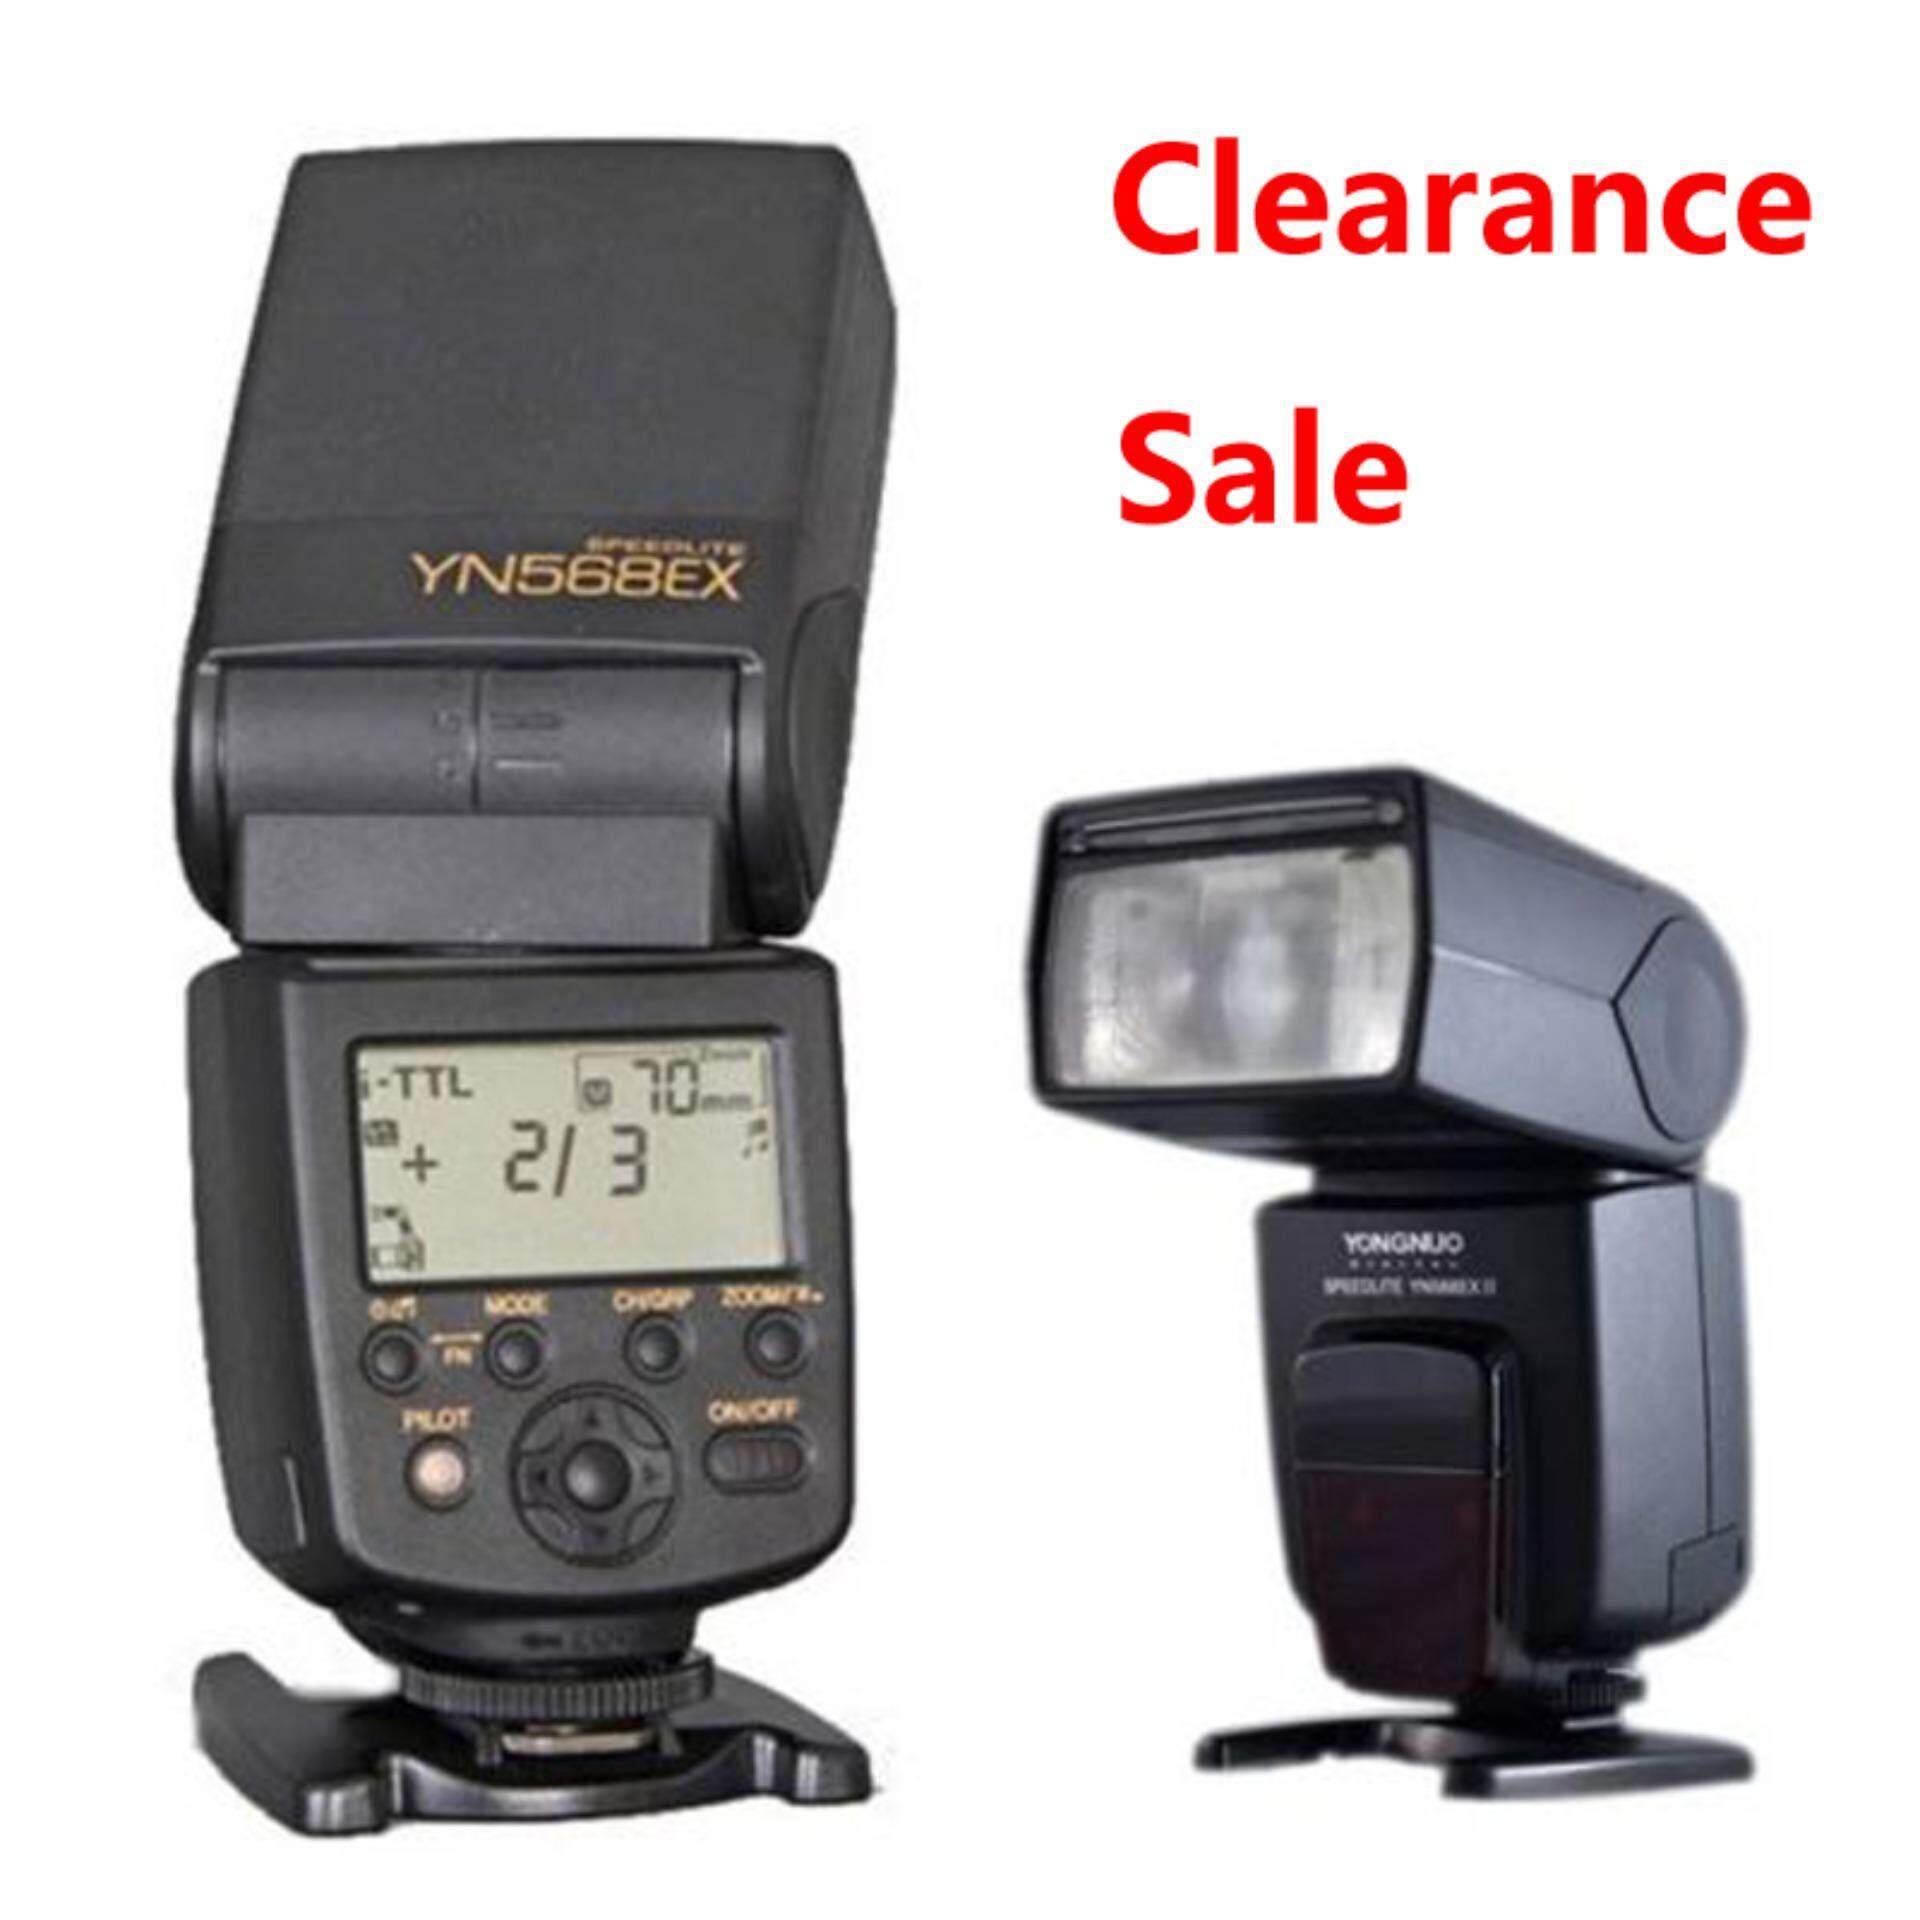 Yongnuo Flashes Price In Malaysia Best Lazada Yn 565ex Ii Ttl Lcd For Canon 568ex Yn568ex Wireless Flash Speedlite Nikon D90 D80 D700 D5200